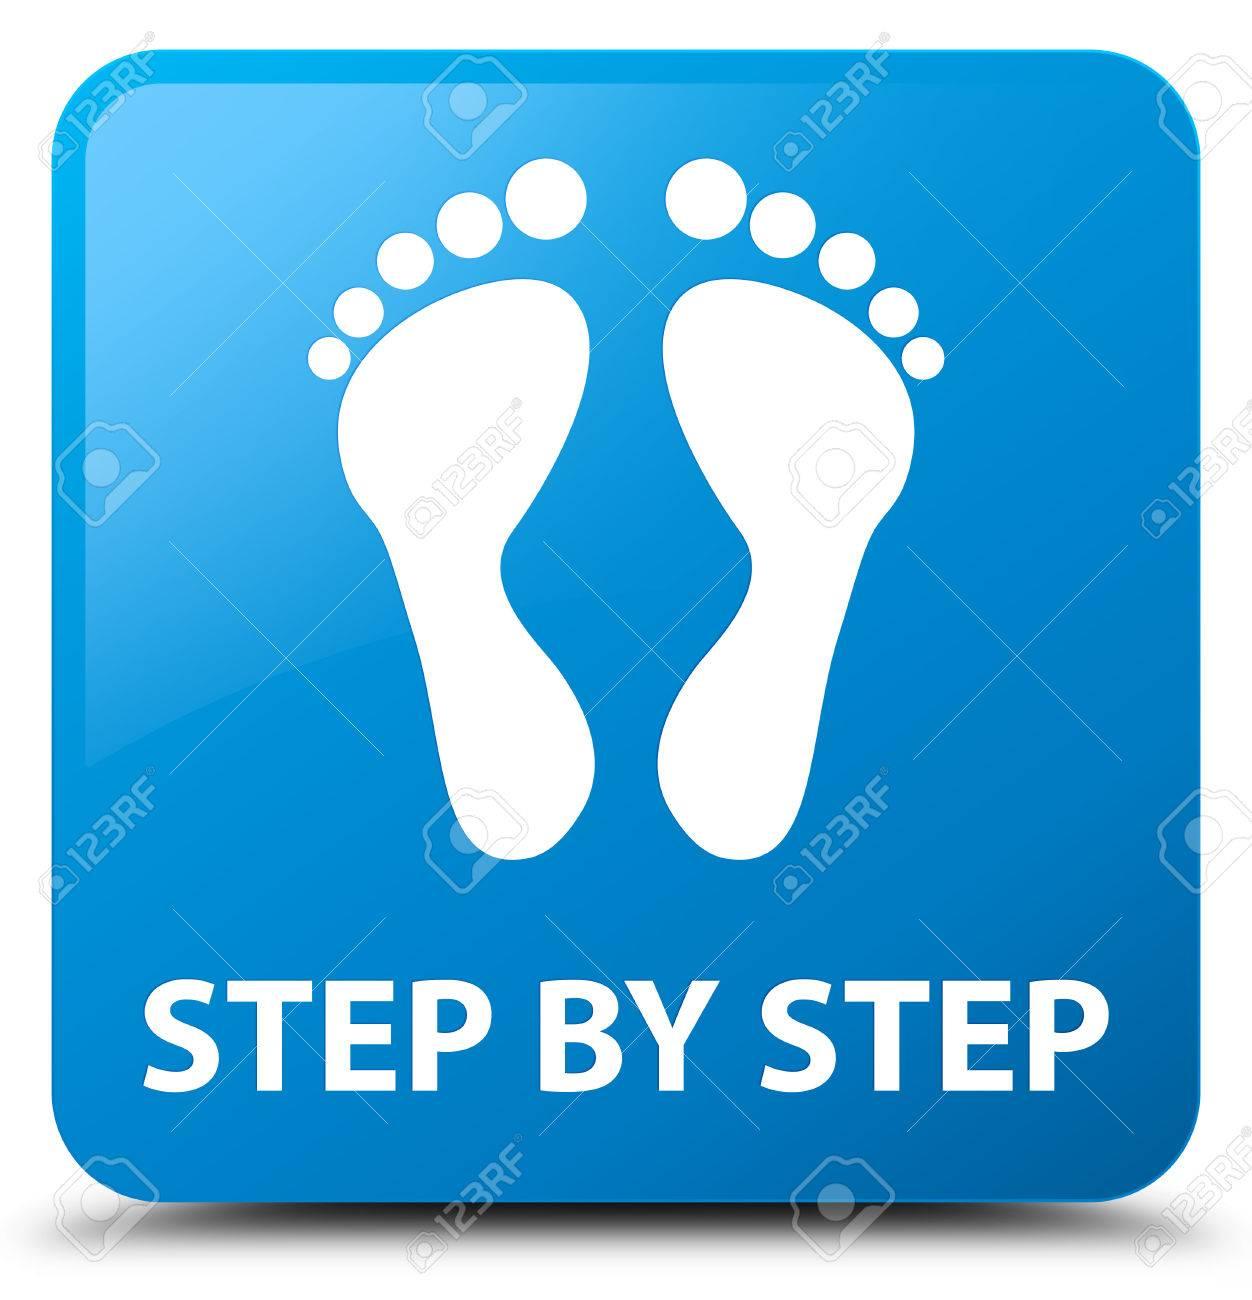 Schritt Für Schritt (Footprint-Symbol) Cyan Blauen Schalter ...